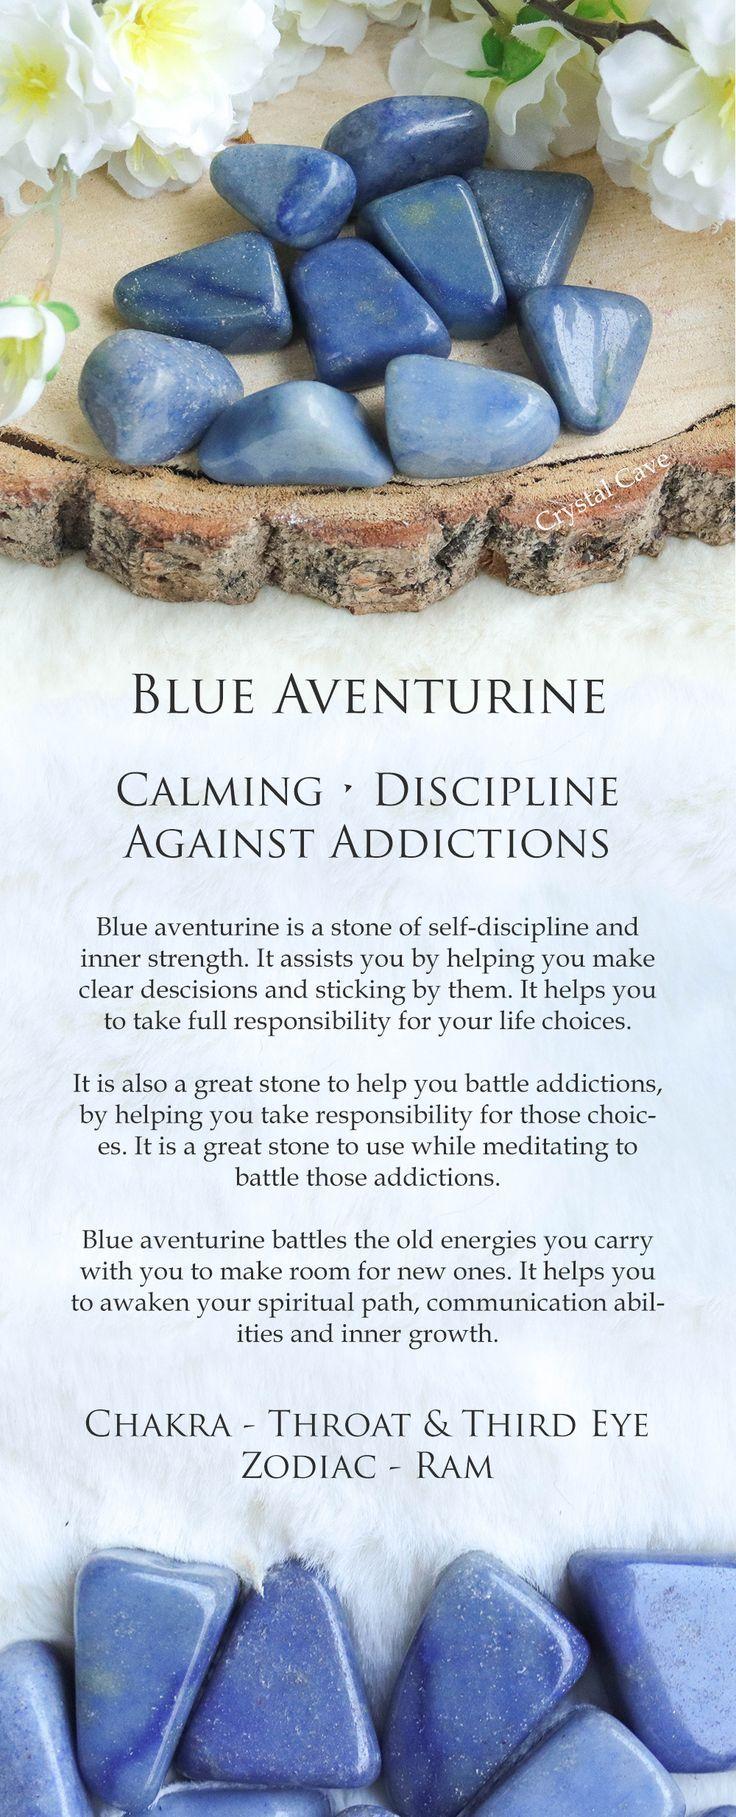 Blue Aventurine Tumbled Stone / Blue Aventurine Cuddle Stone / Crystal Against Addiction / Gemstone for Strength and Discipline / Meditation